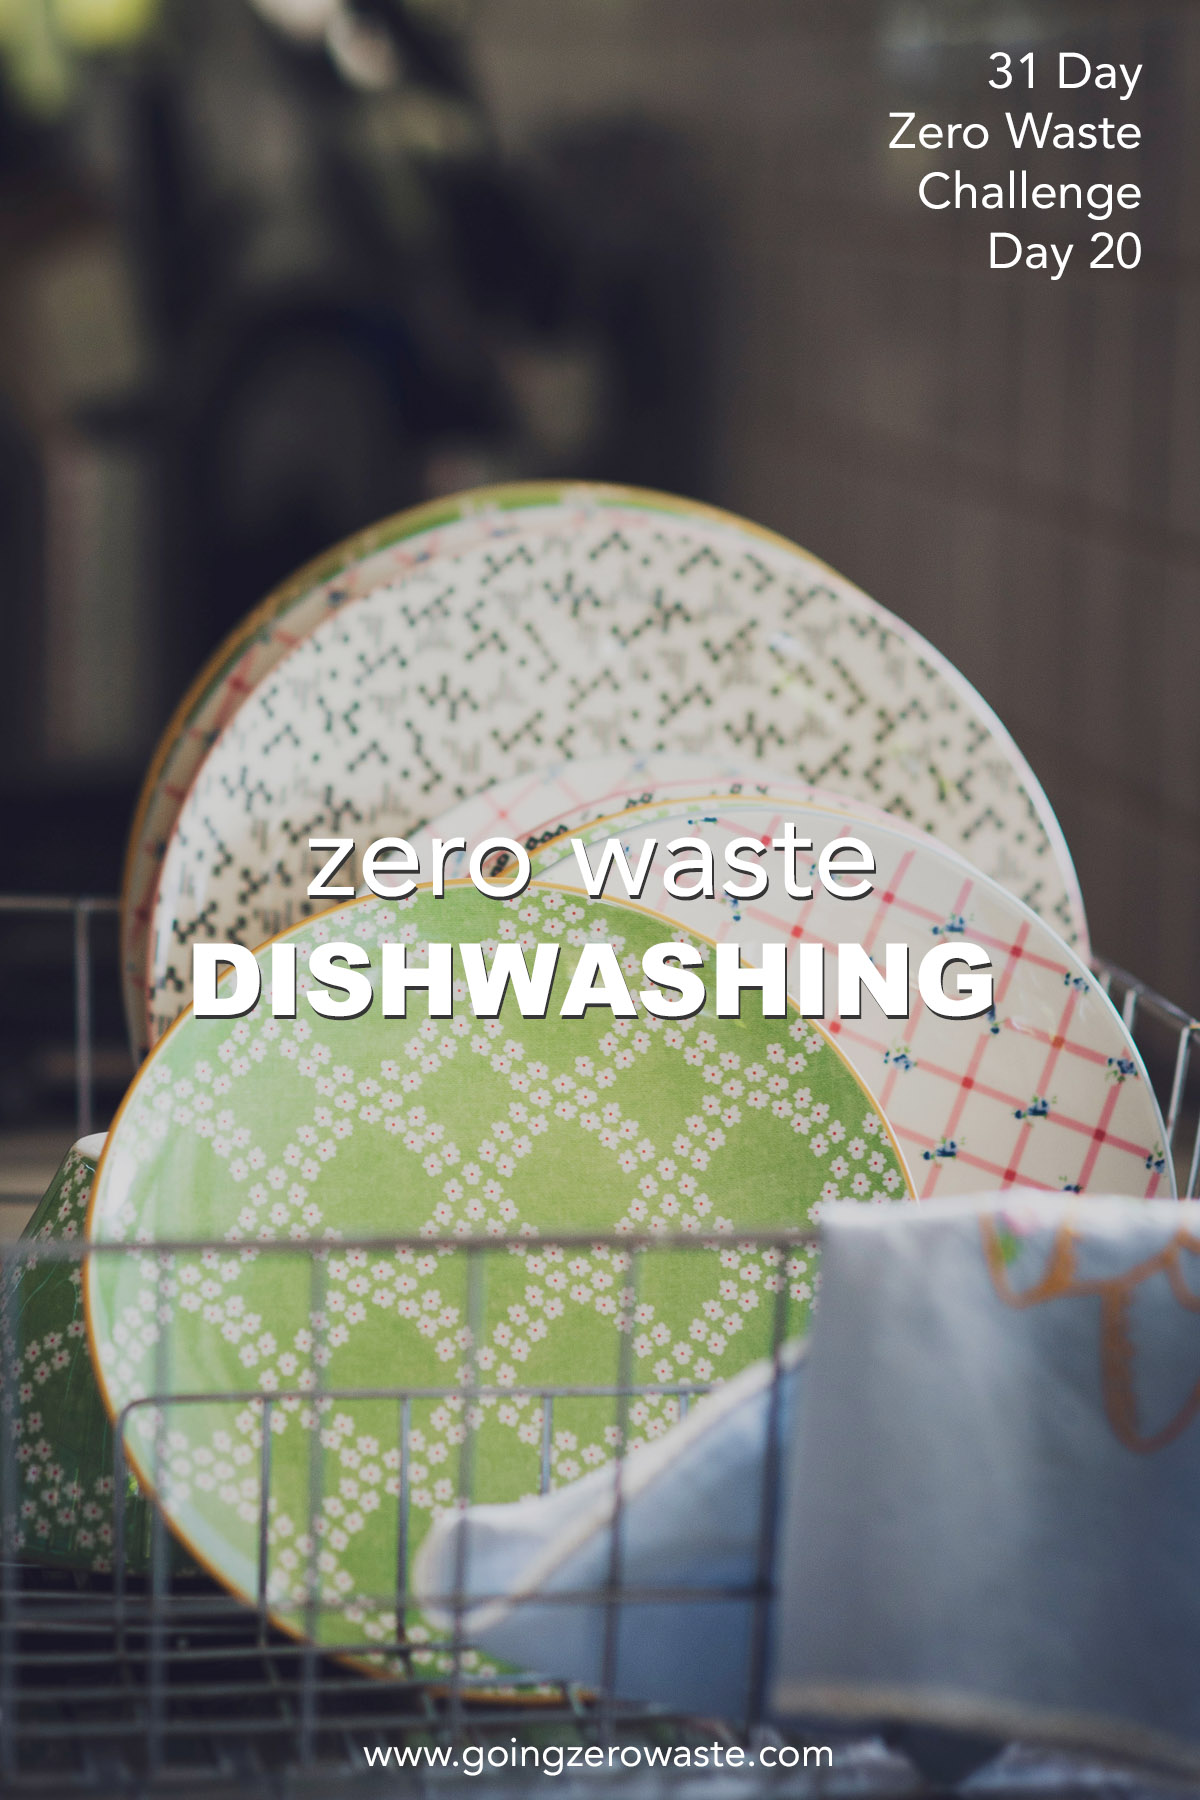 zero waste dishwashing from day 20 of the zero waste challenge from www.goingzerowaste.com #zerowaste #dishwashing #zerowastechallenge